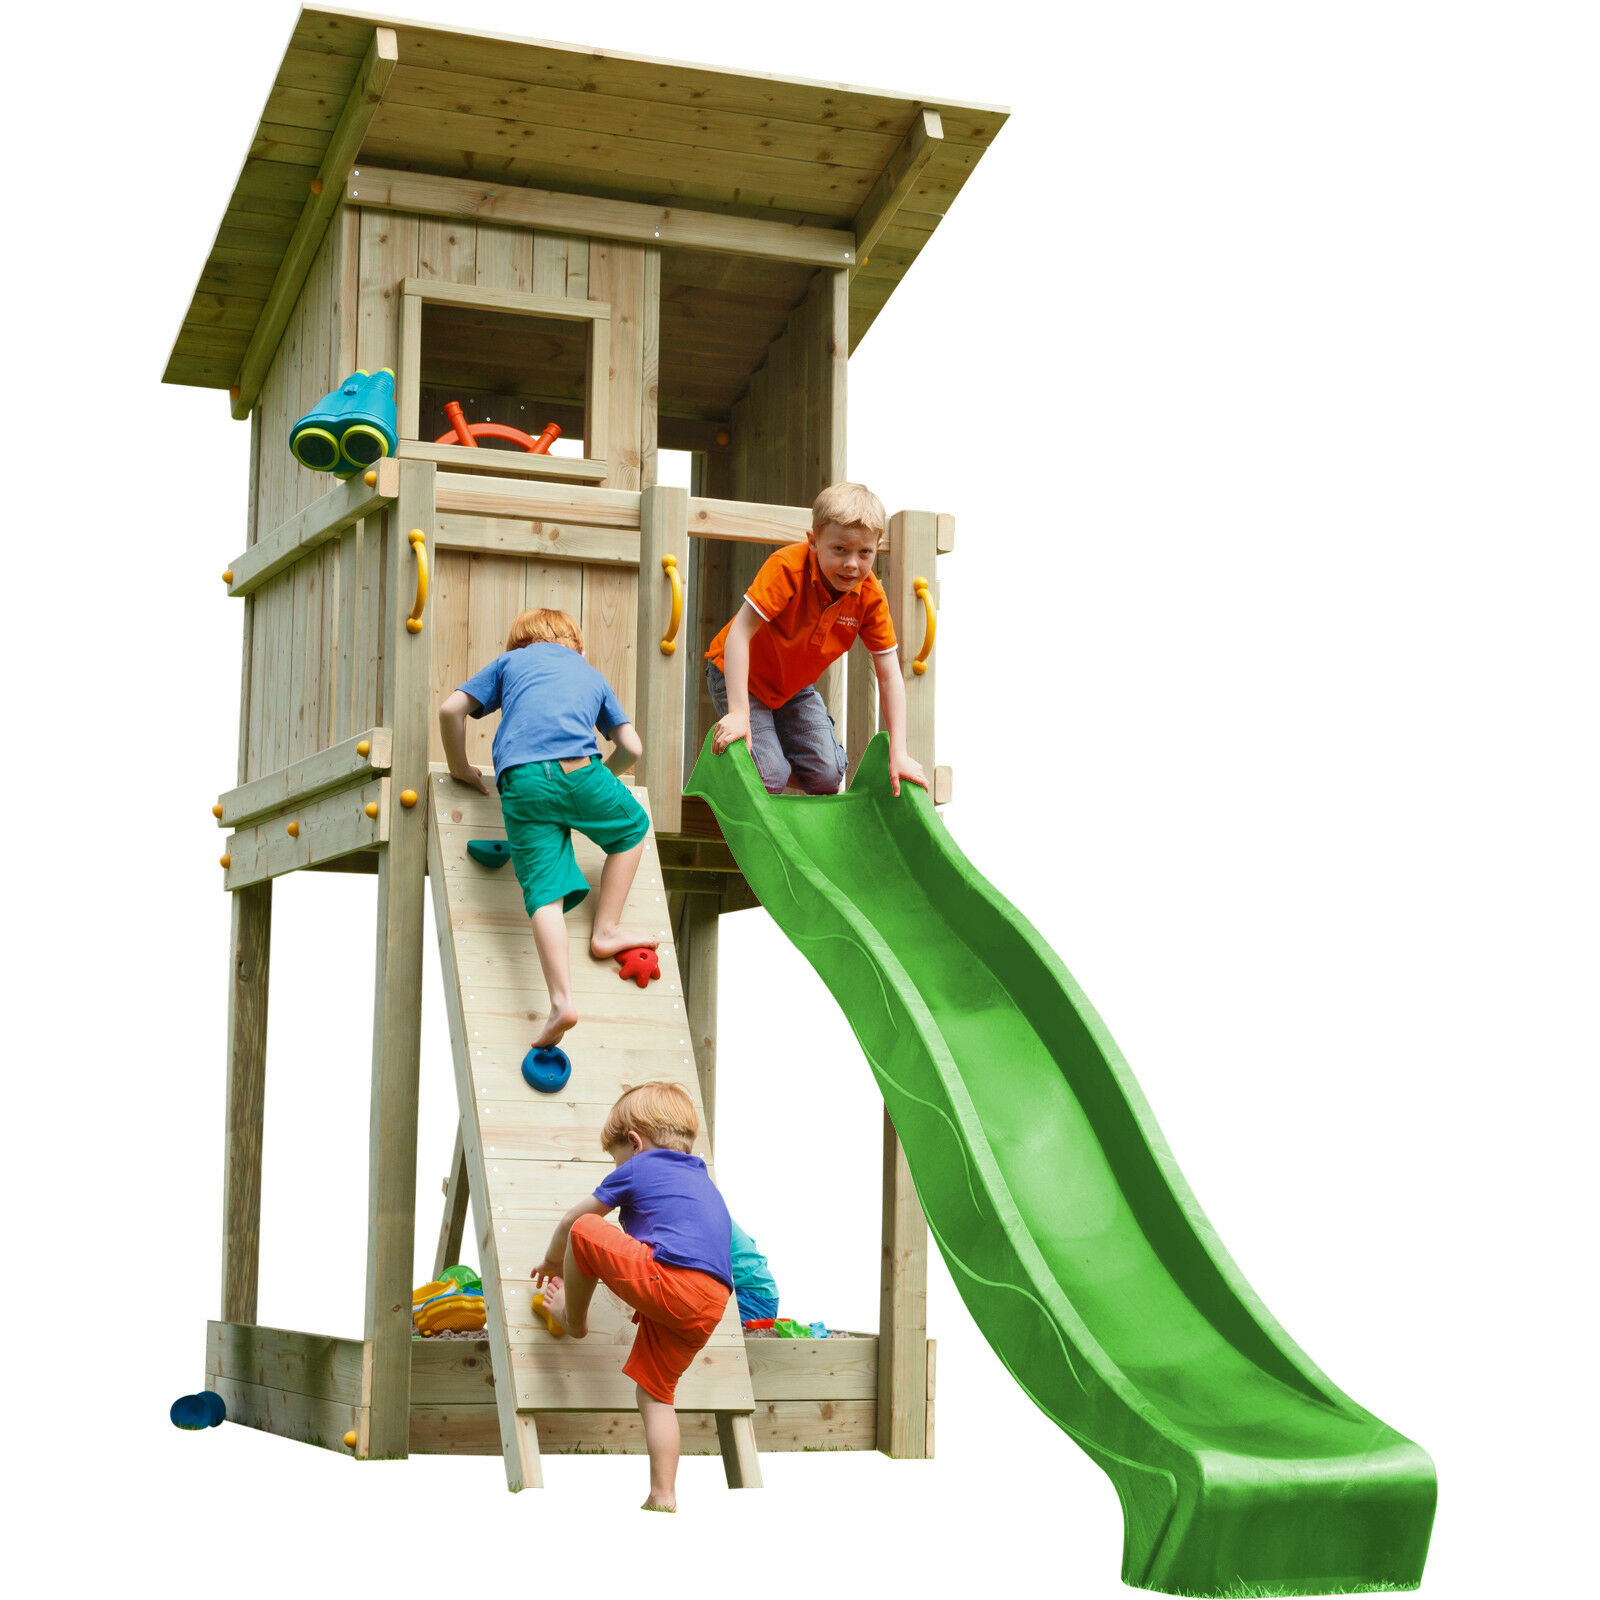 Spielturm BEACH HUT mit Rutsche Kletterwand Kletterturm Holzturm Spielhaus